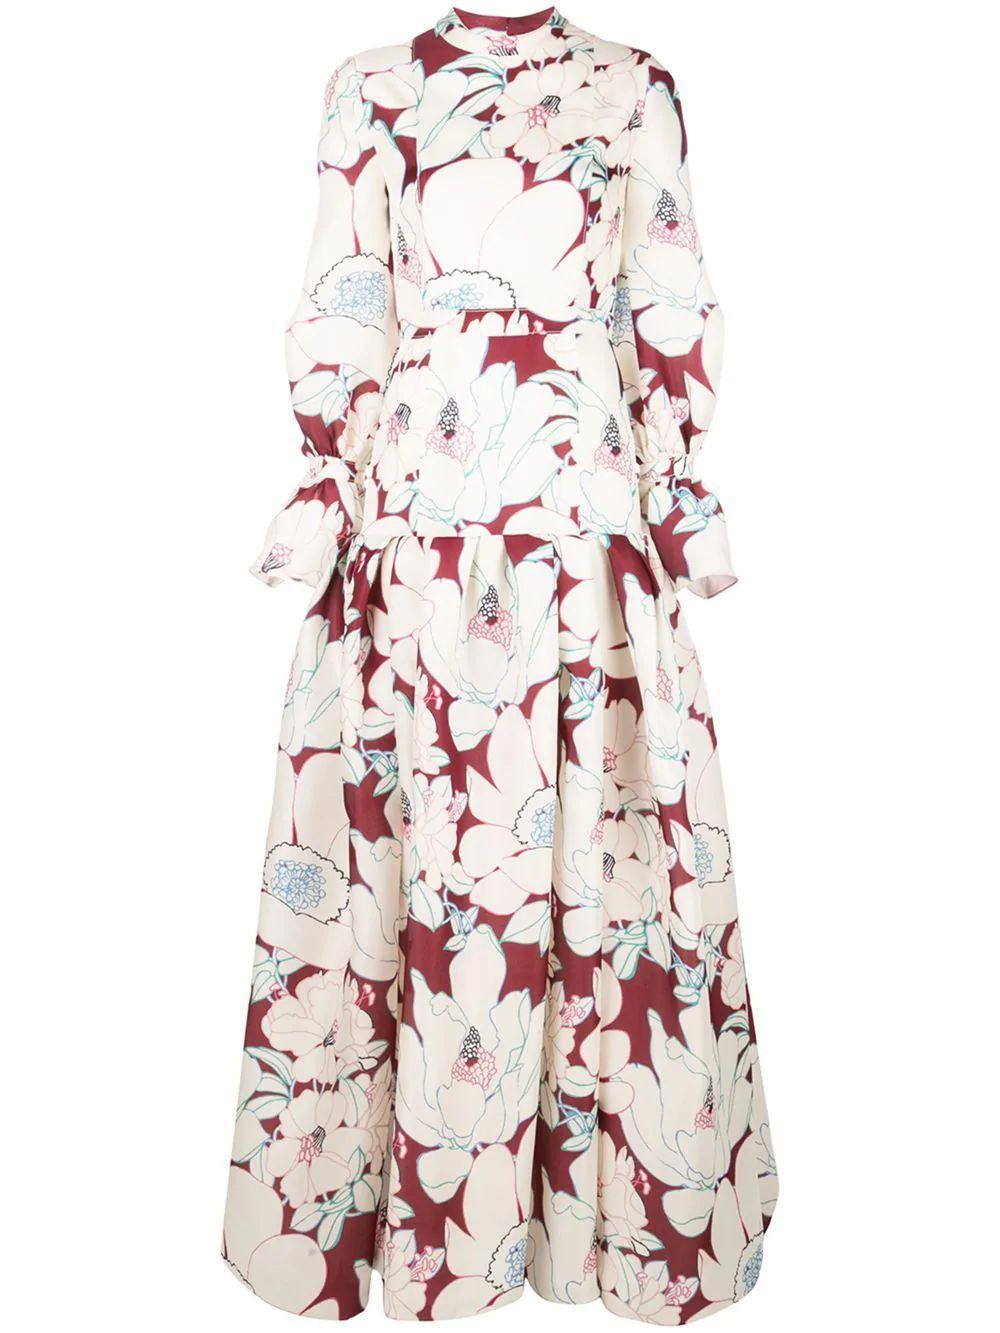 Floral Print Gauze Puff Sleeve Drop Waist Gown Item # P1911N715OGA